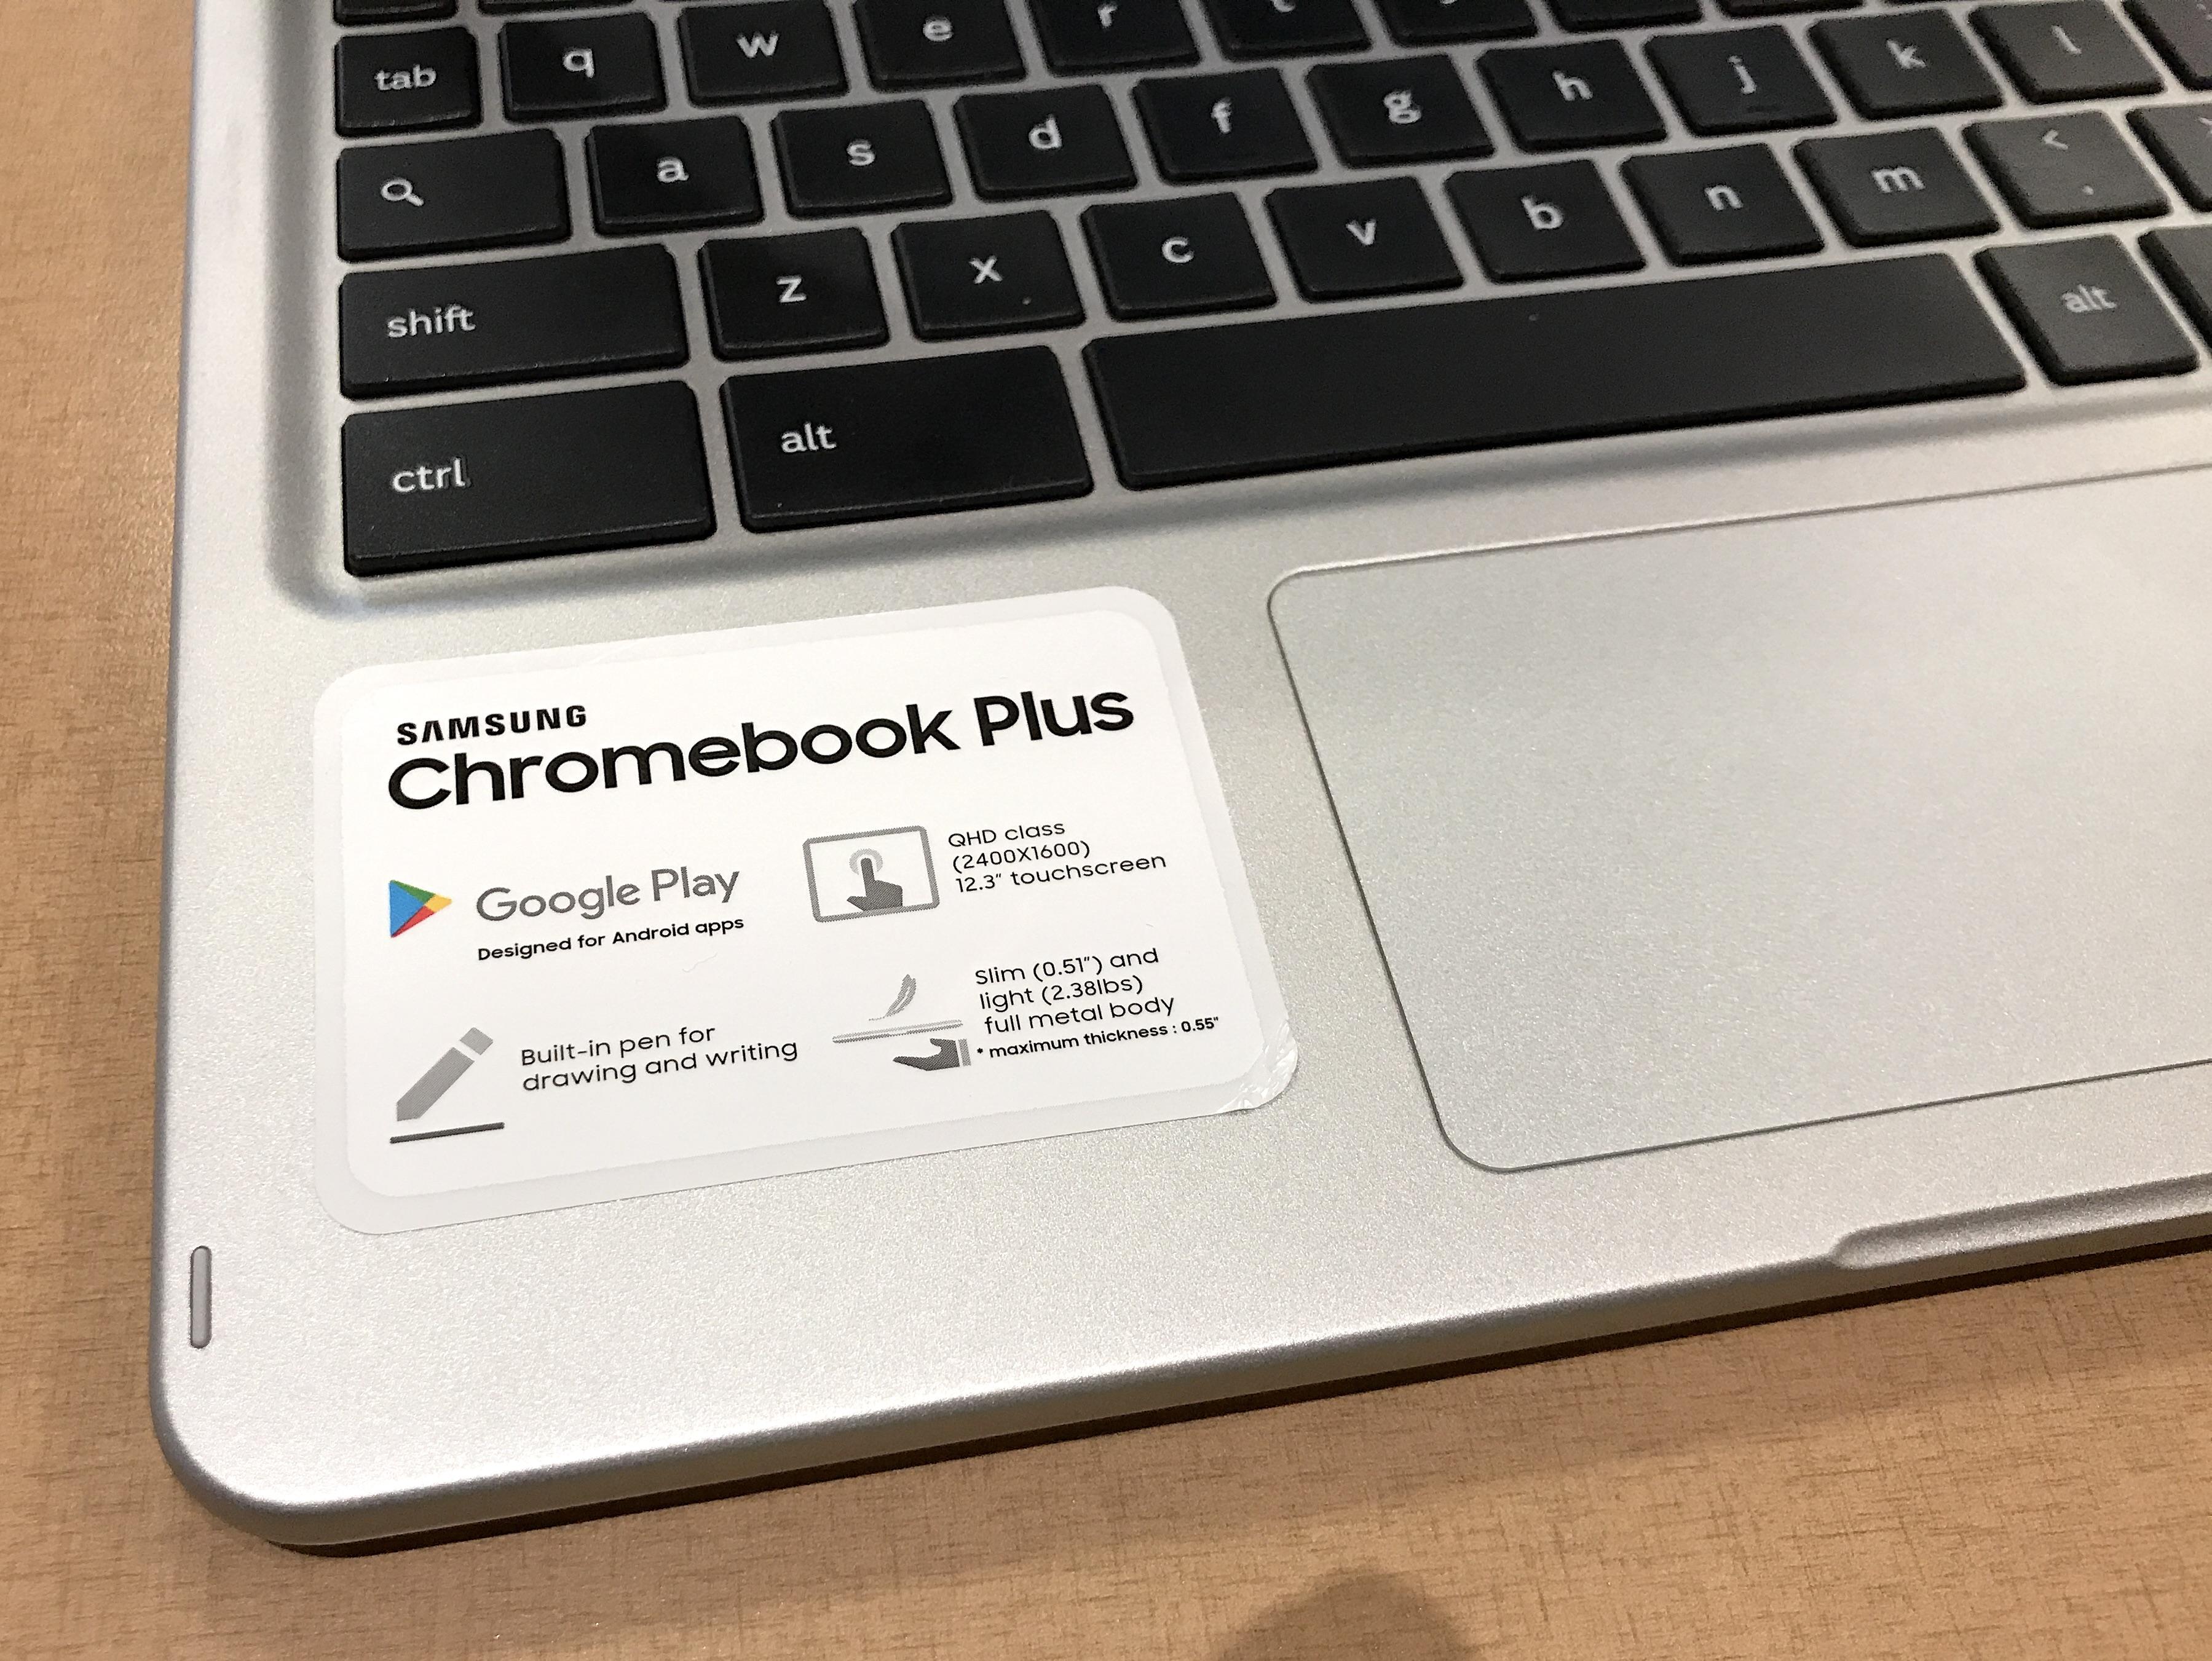 Samsung Chromebook Plus specs